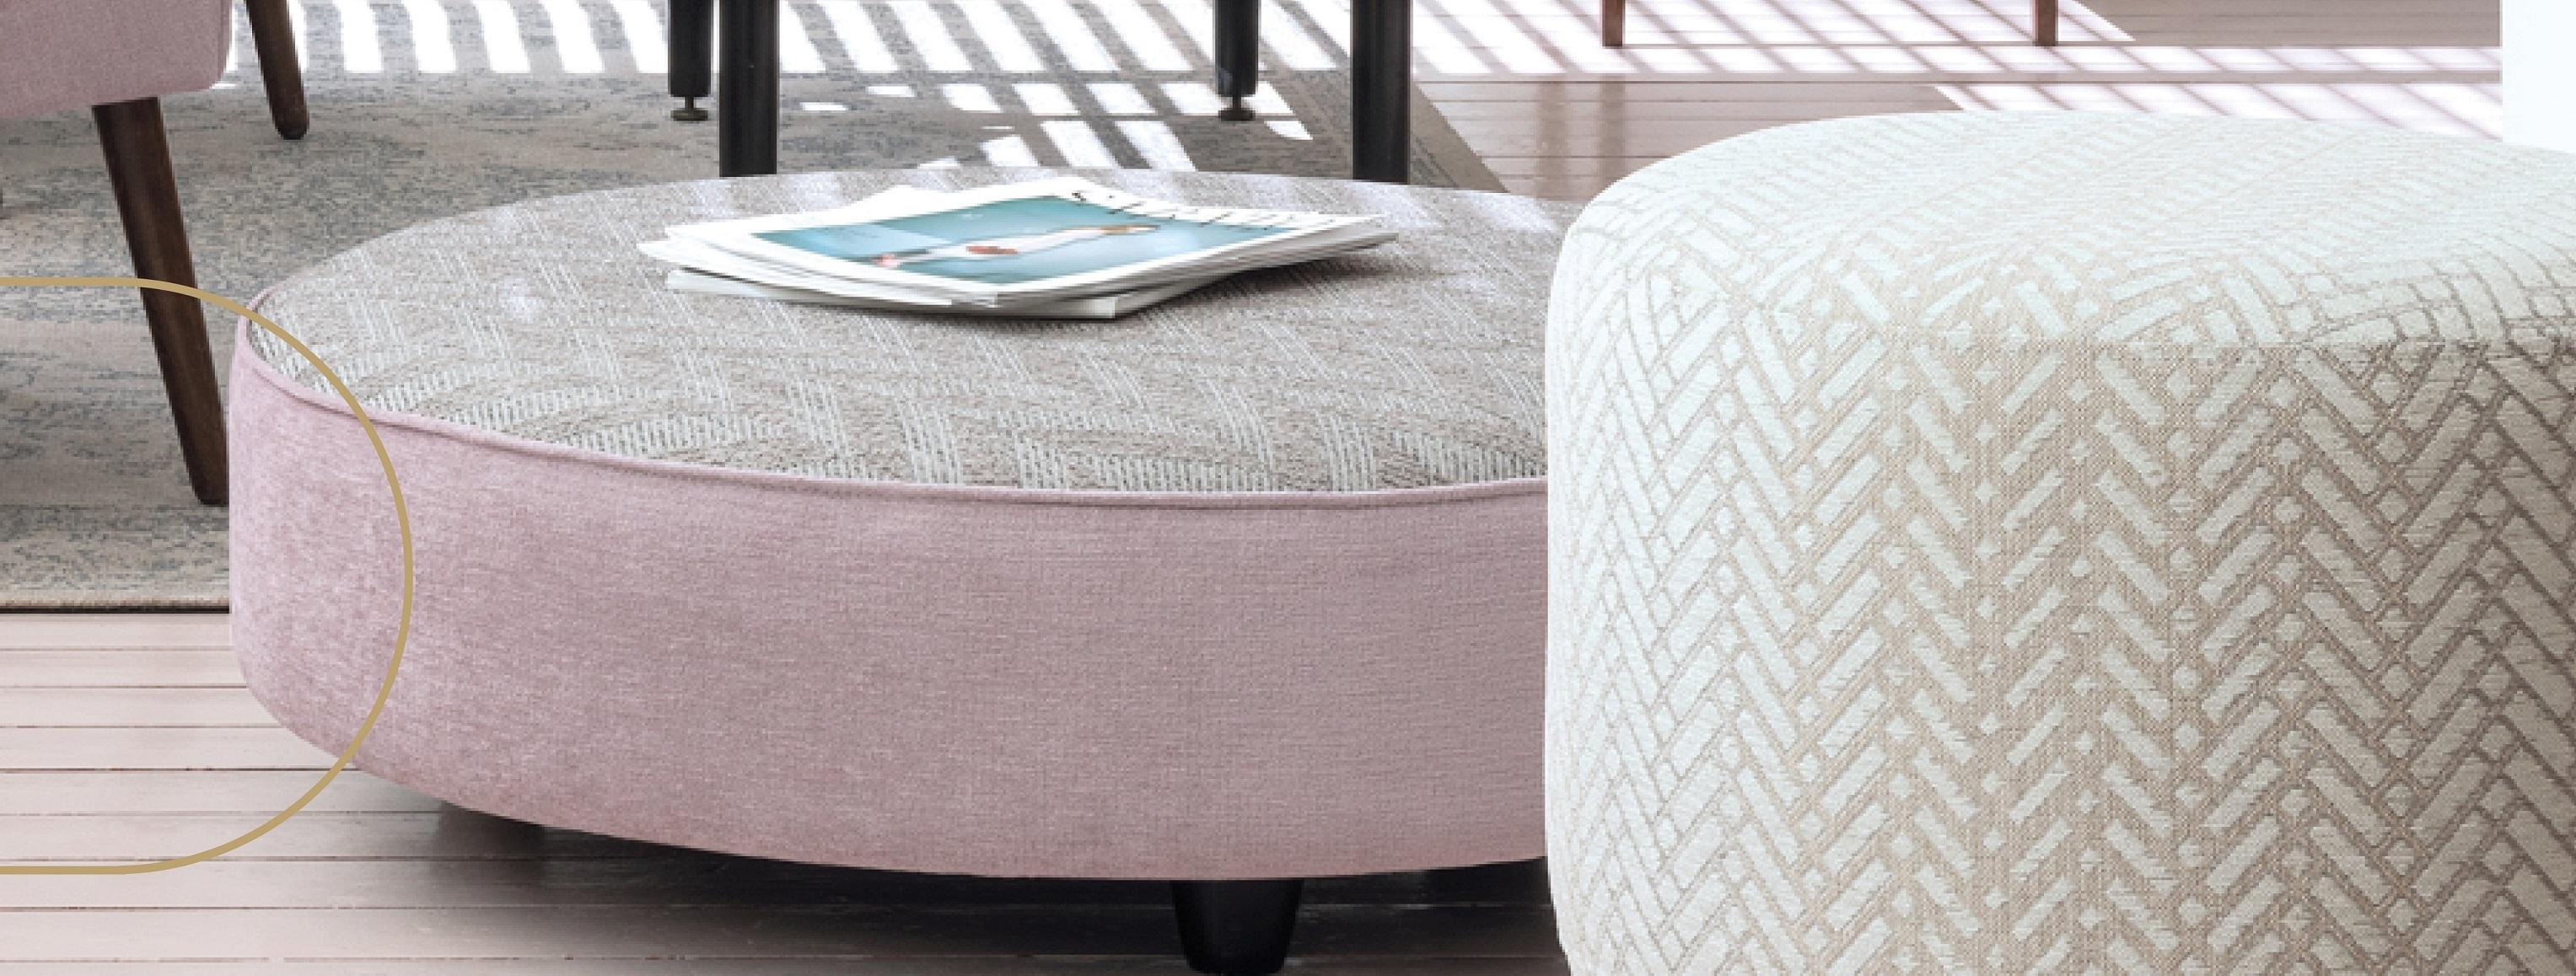 3 inherently fire-retardant fabrics in geometric herringbone patterns